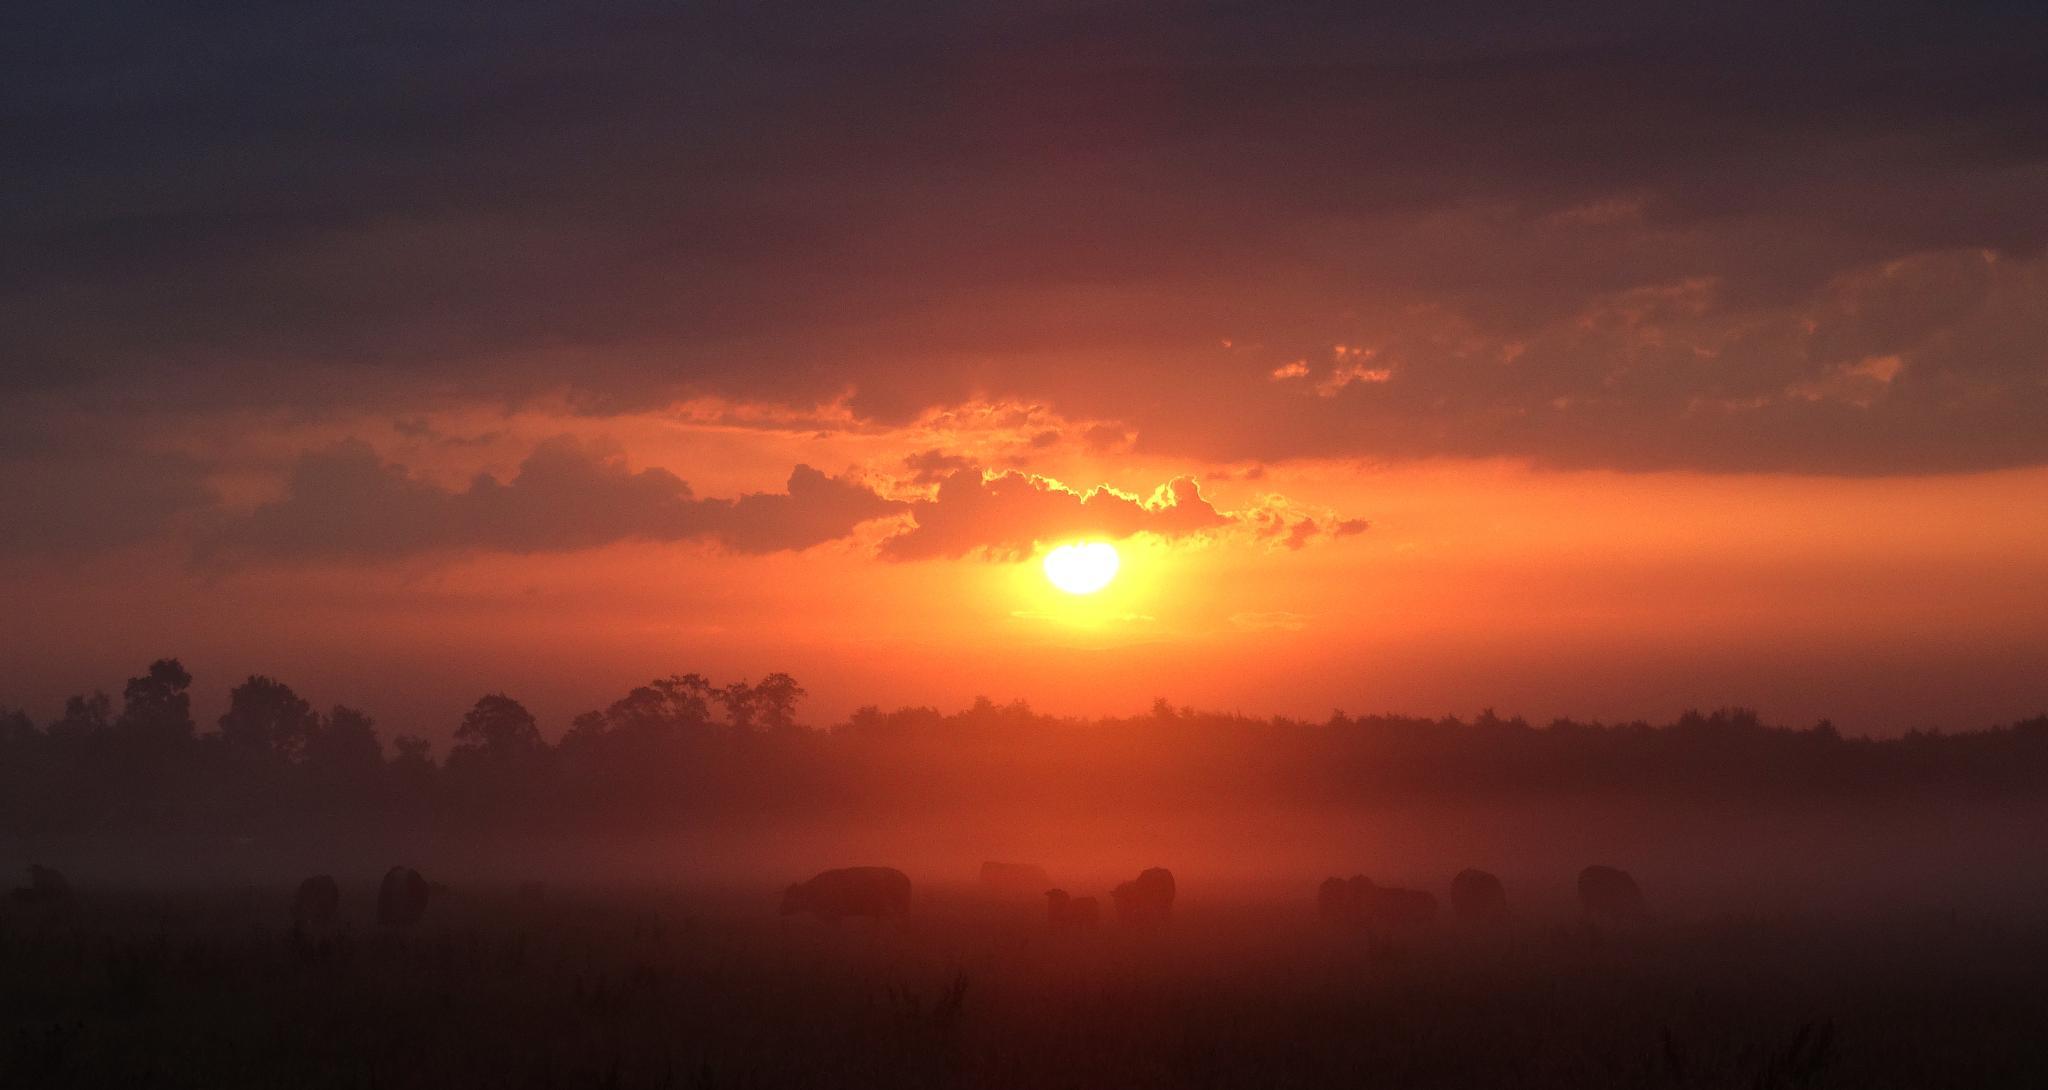 Sun fights to get through the morning fog by GertdeVos